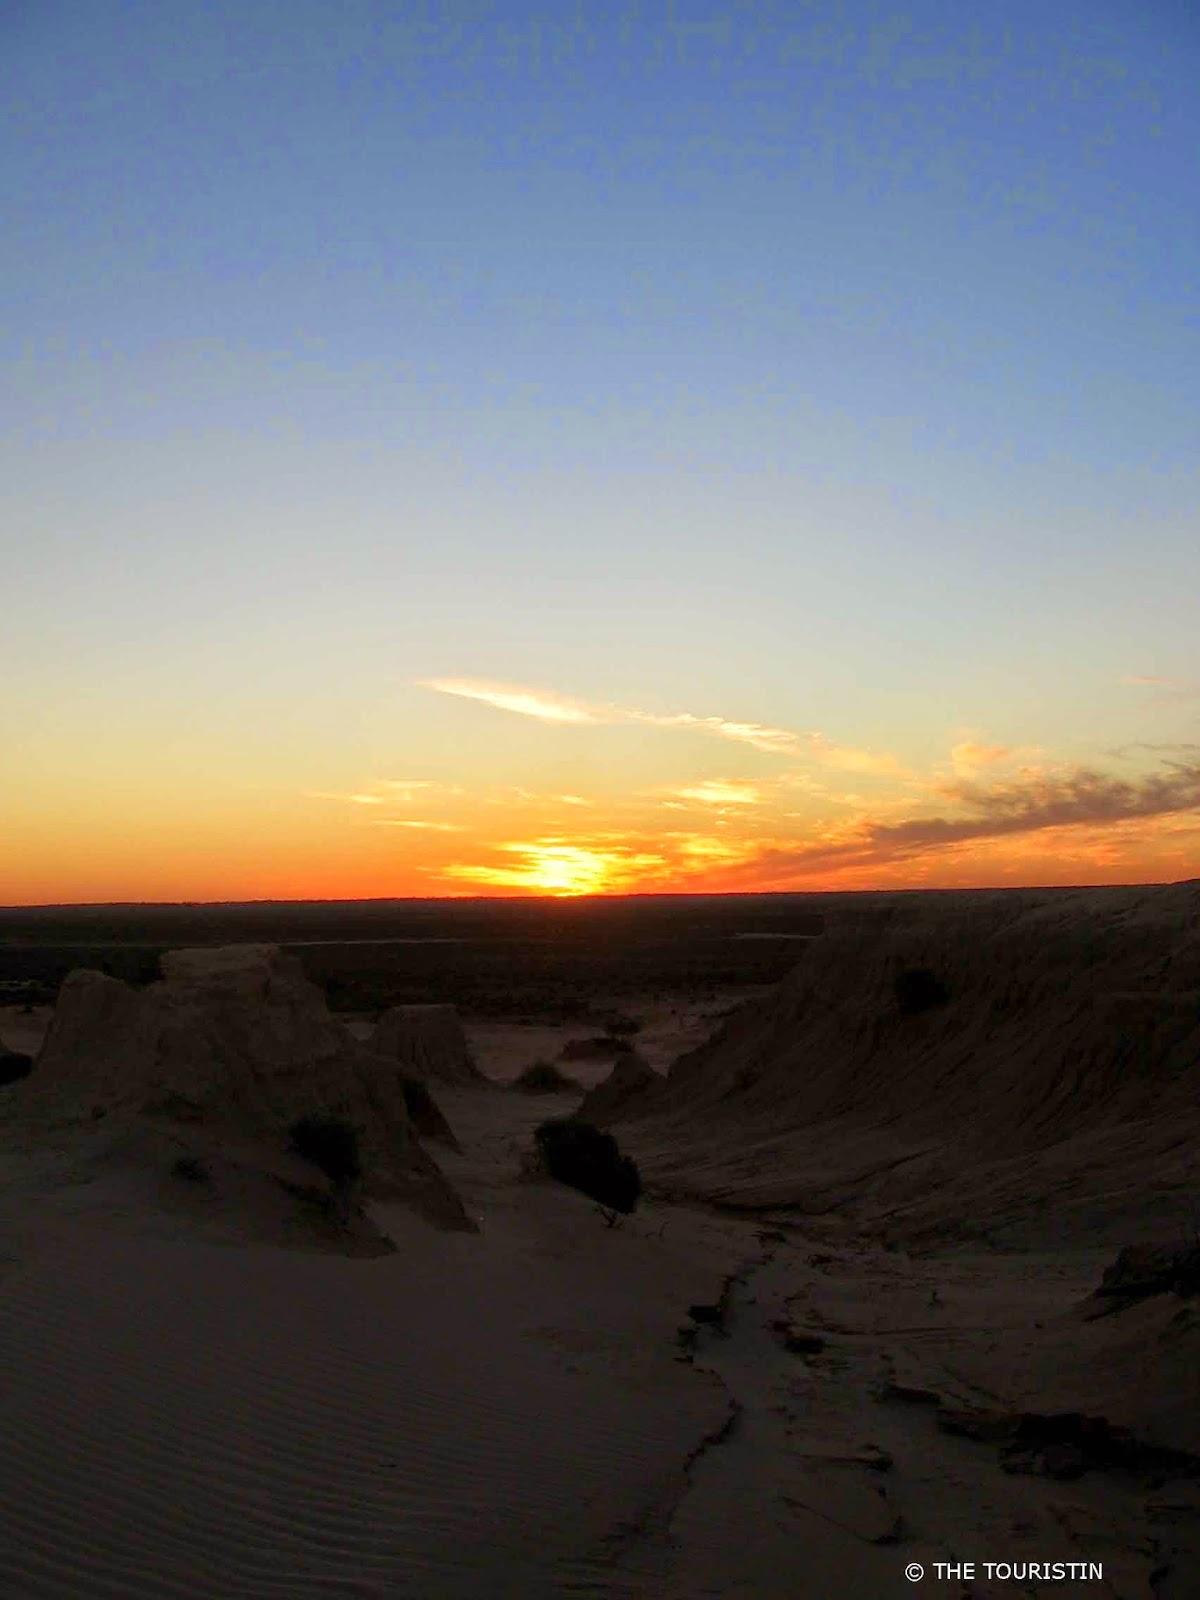 Sunset over a desert landscape.